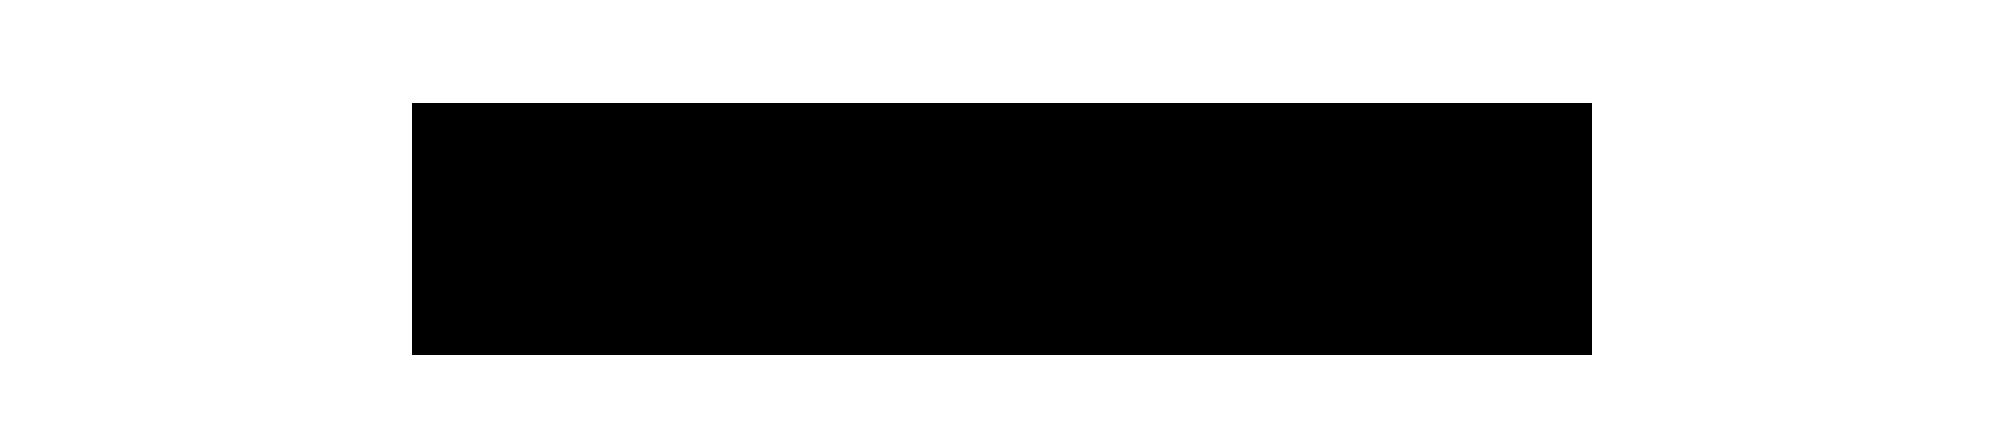 003 - Microsoft_BrandGuide_Mar2013.pdf-6.png